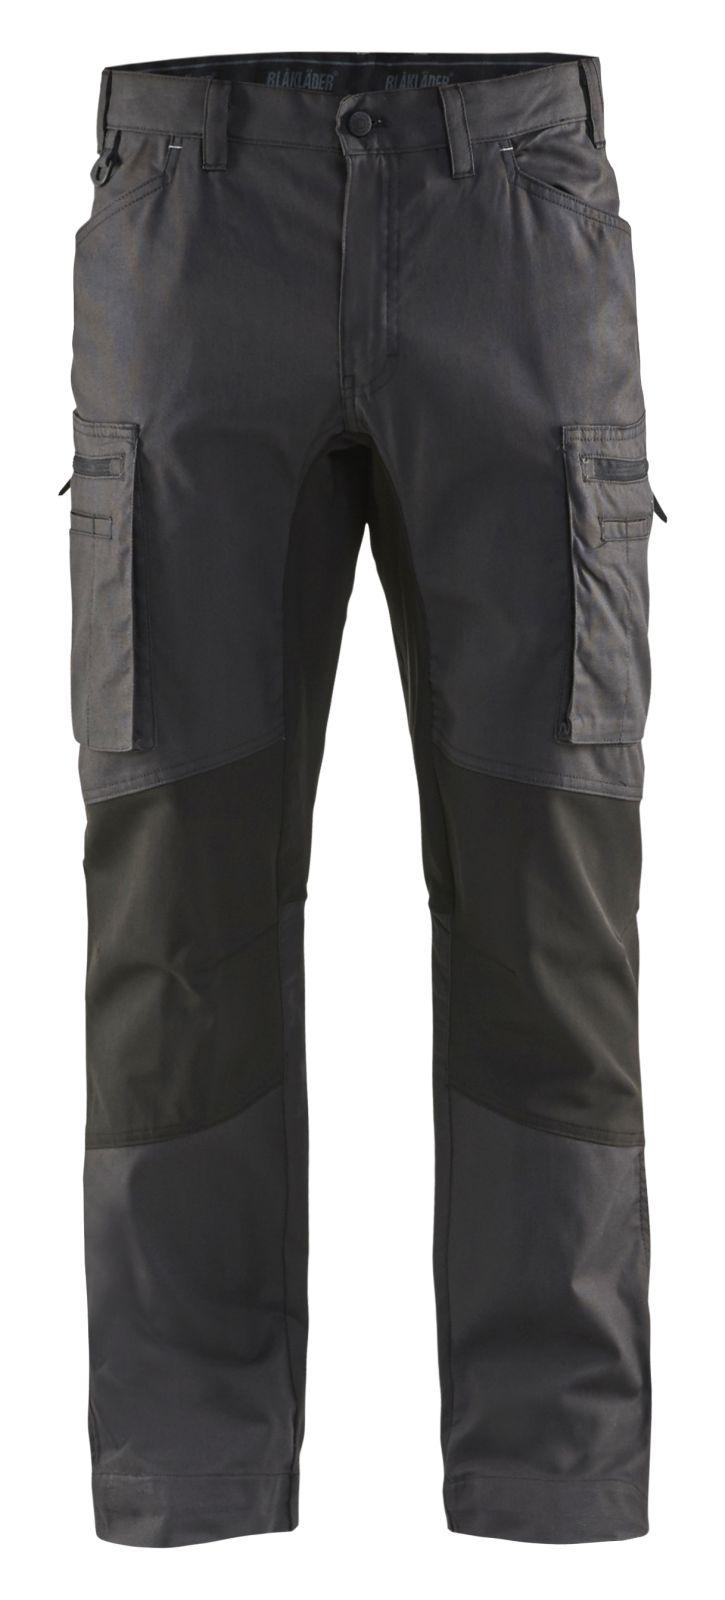 Blaklader Werkbroeken 14591146 met Stretch donkergrijs-zwart(9899)